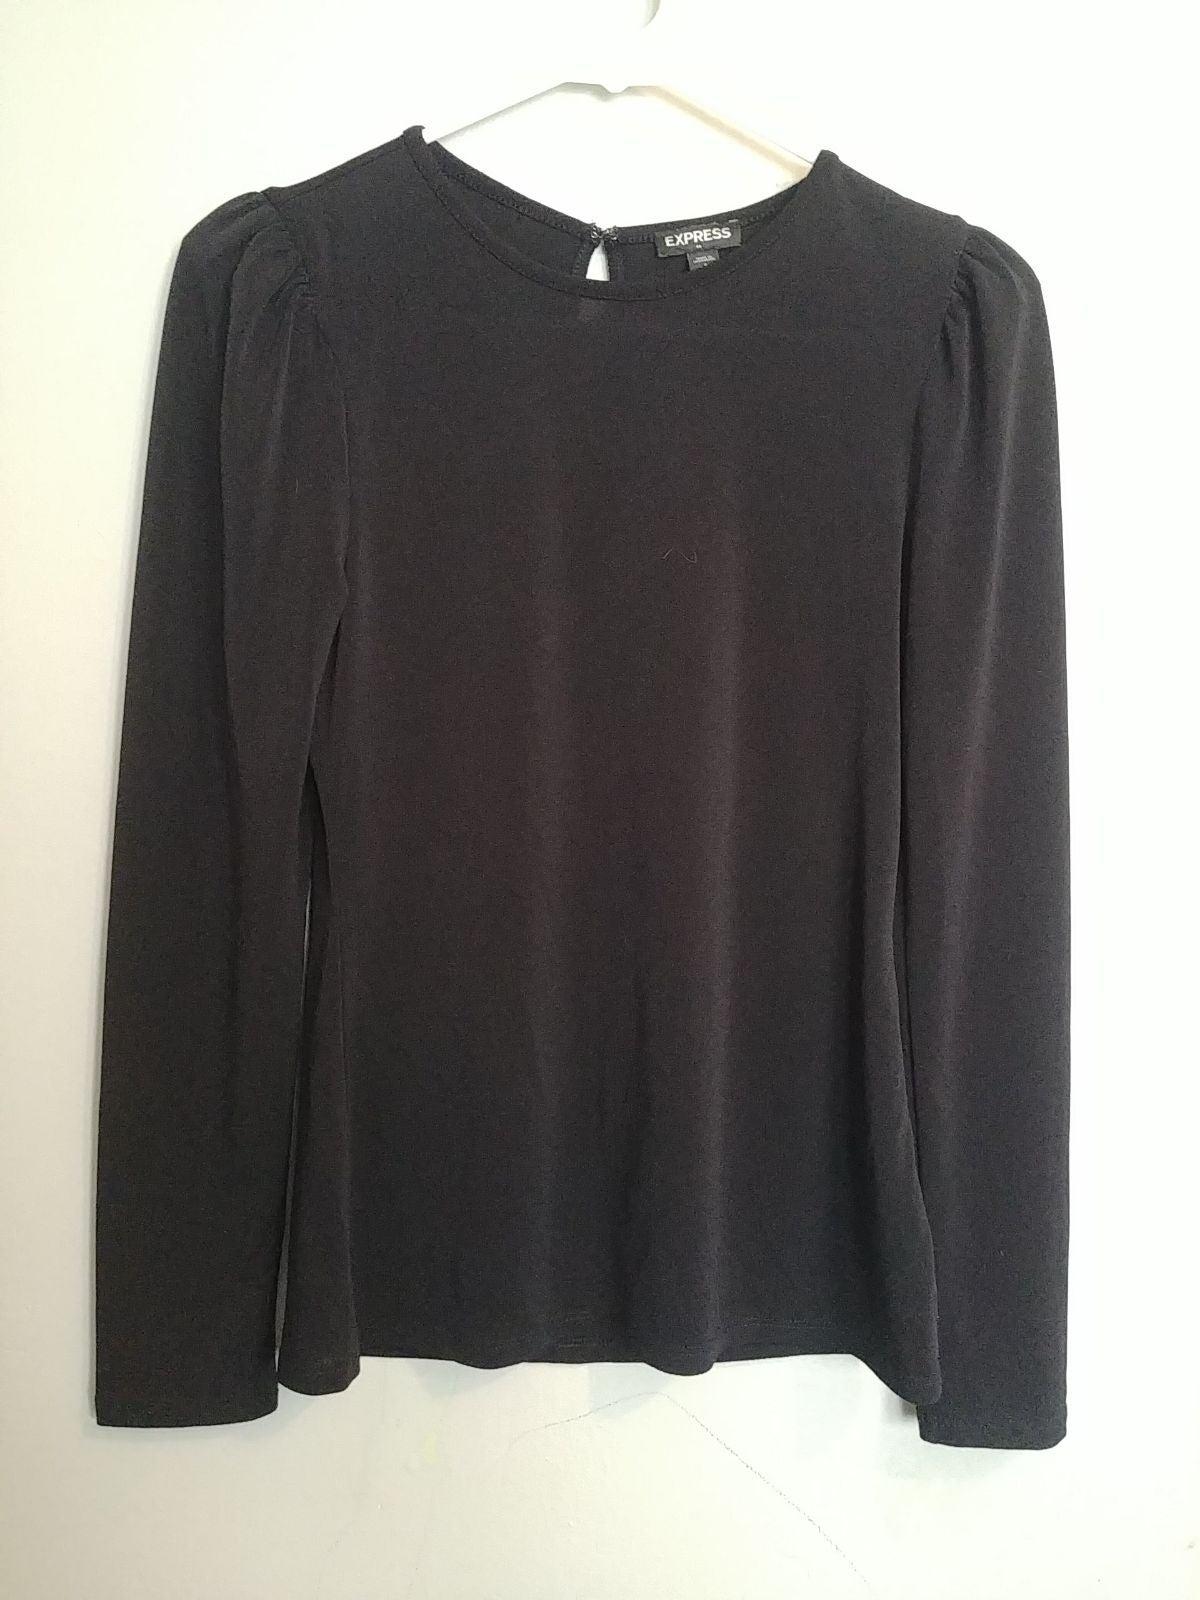 Express Women's Shirt Size Small